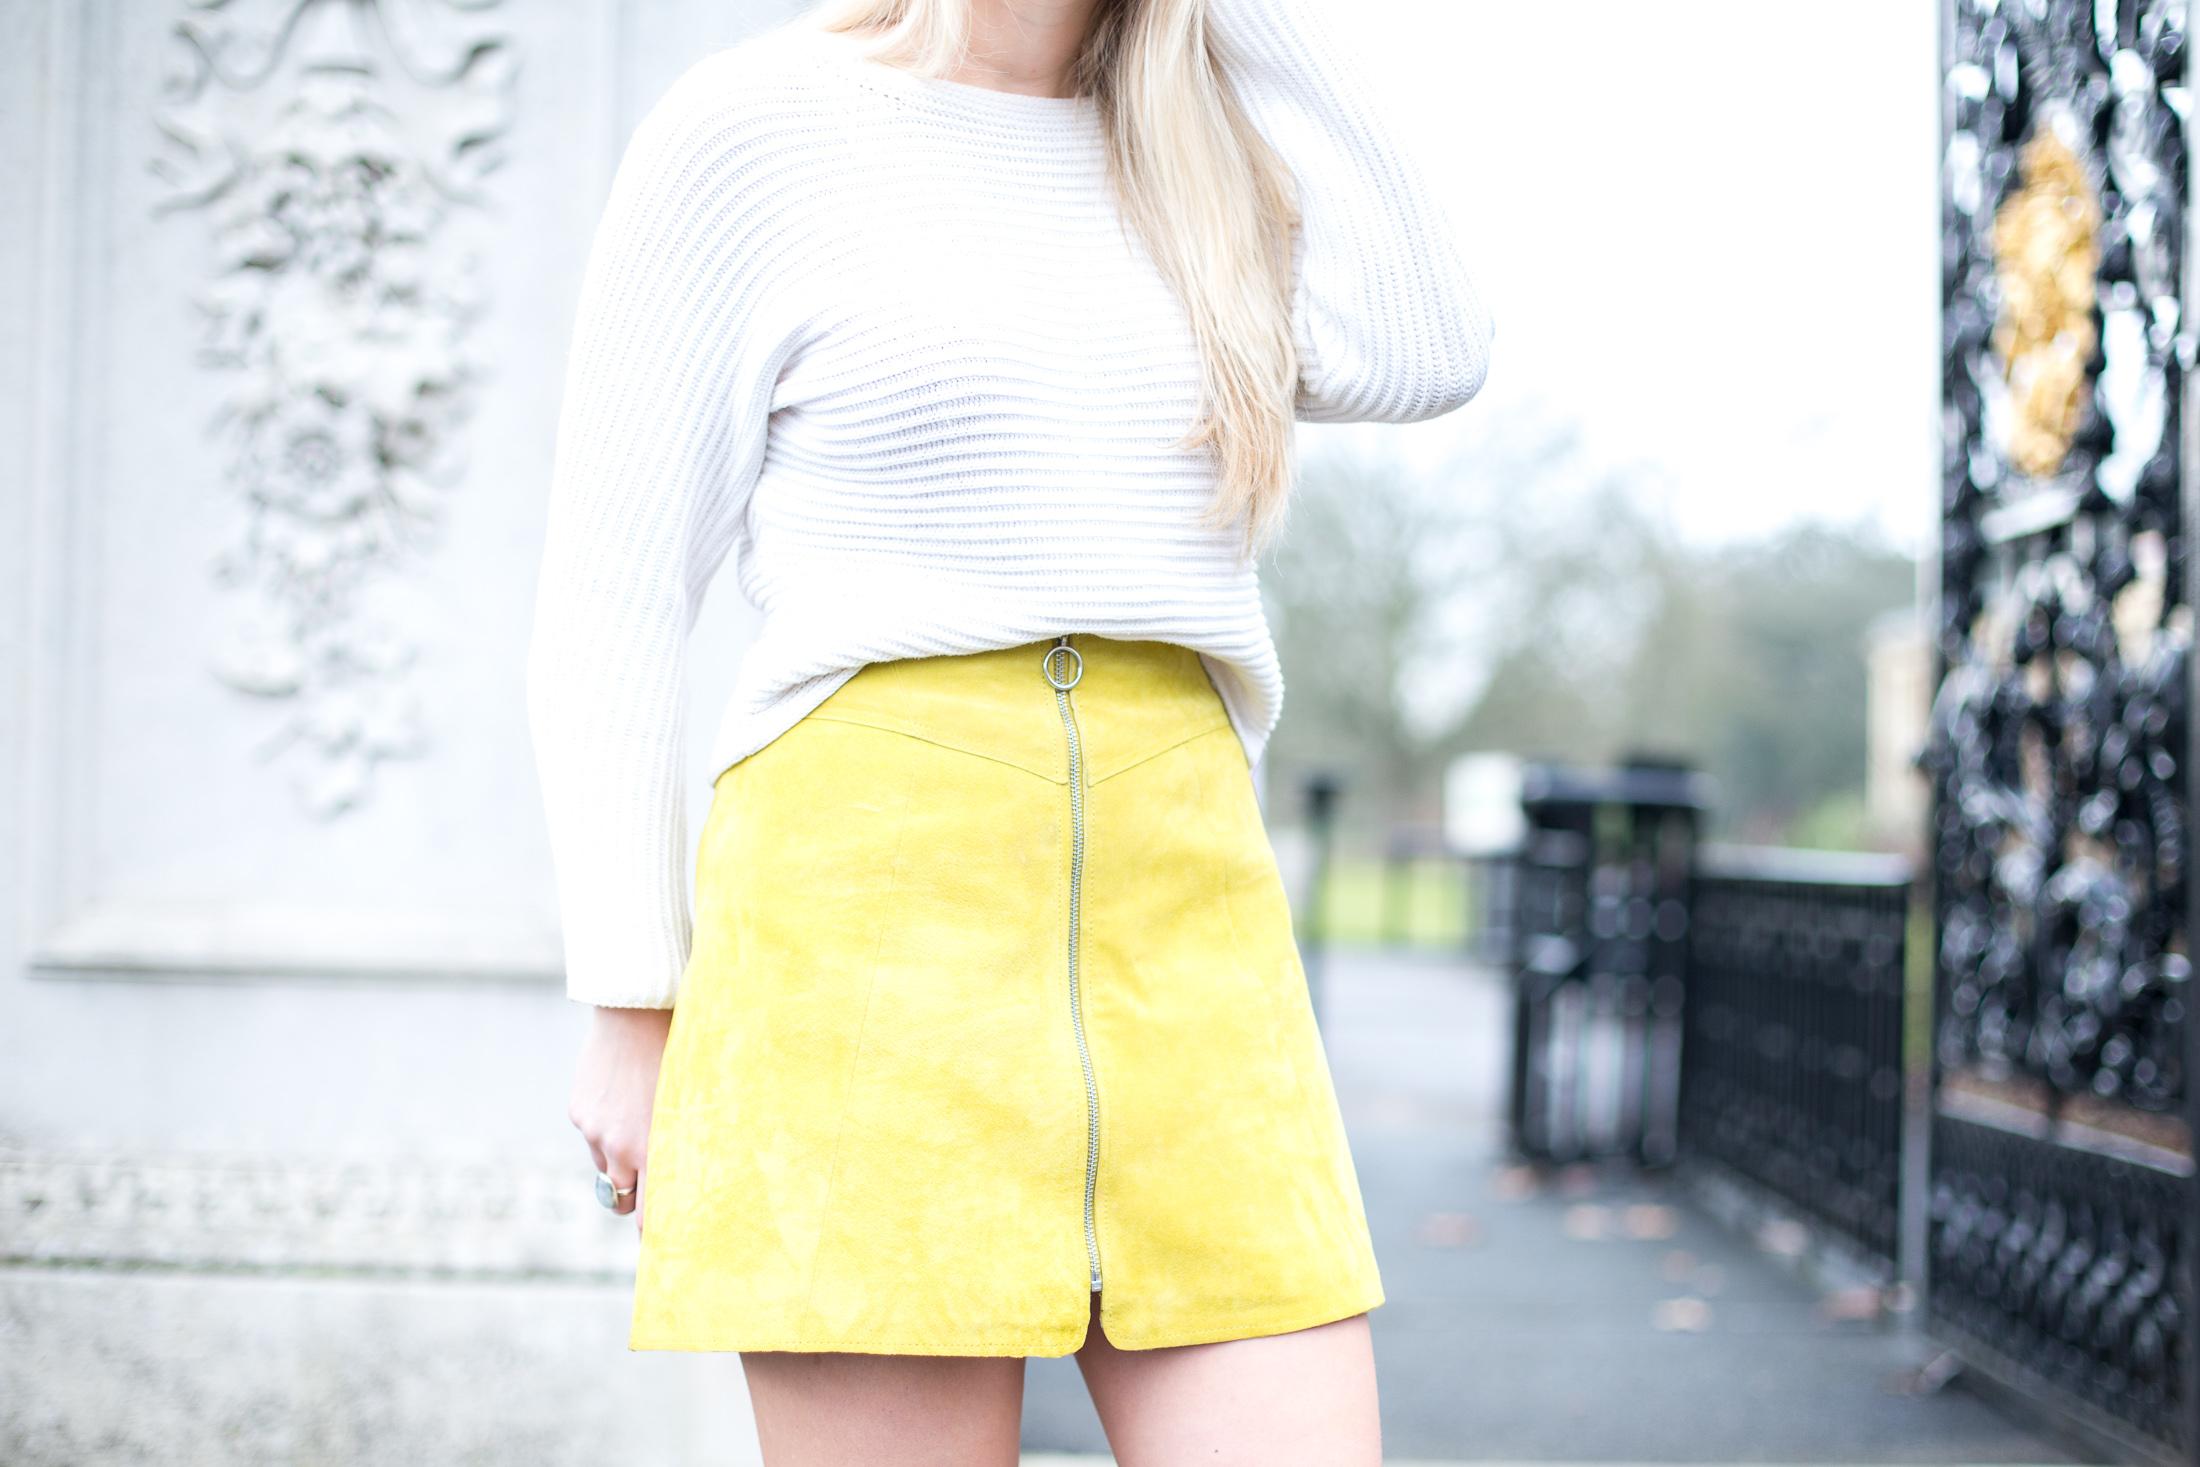 ASOS Suede Skirt